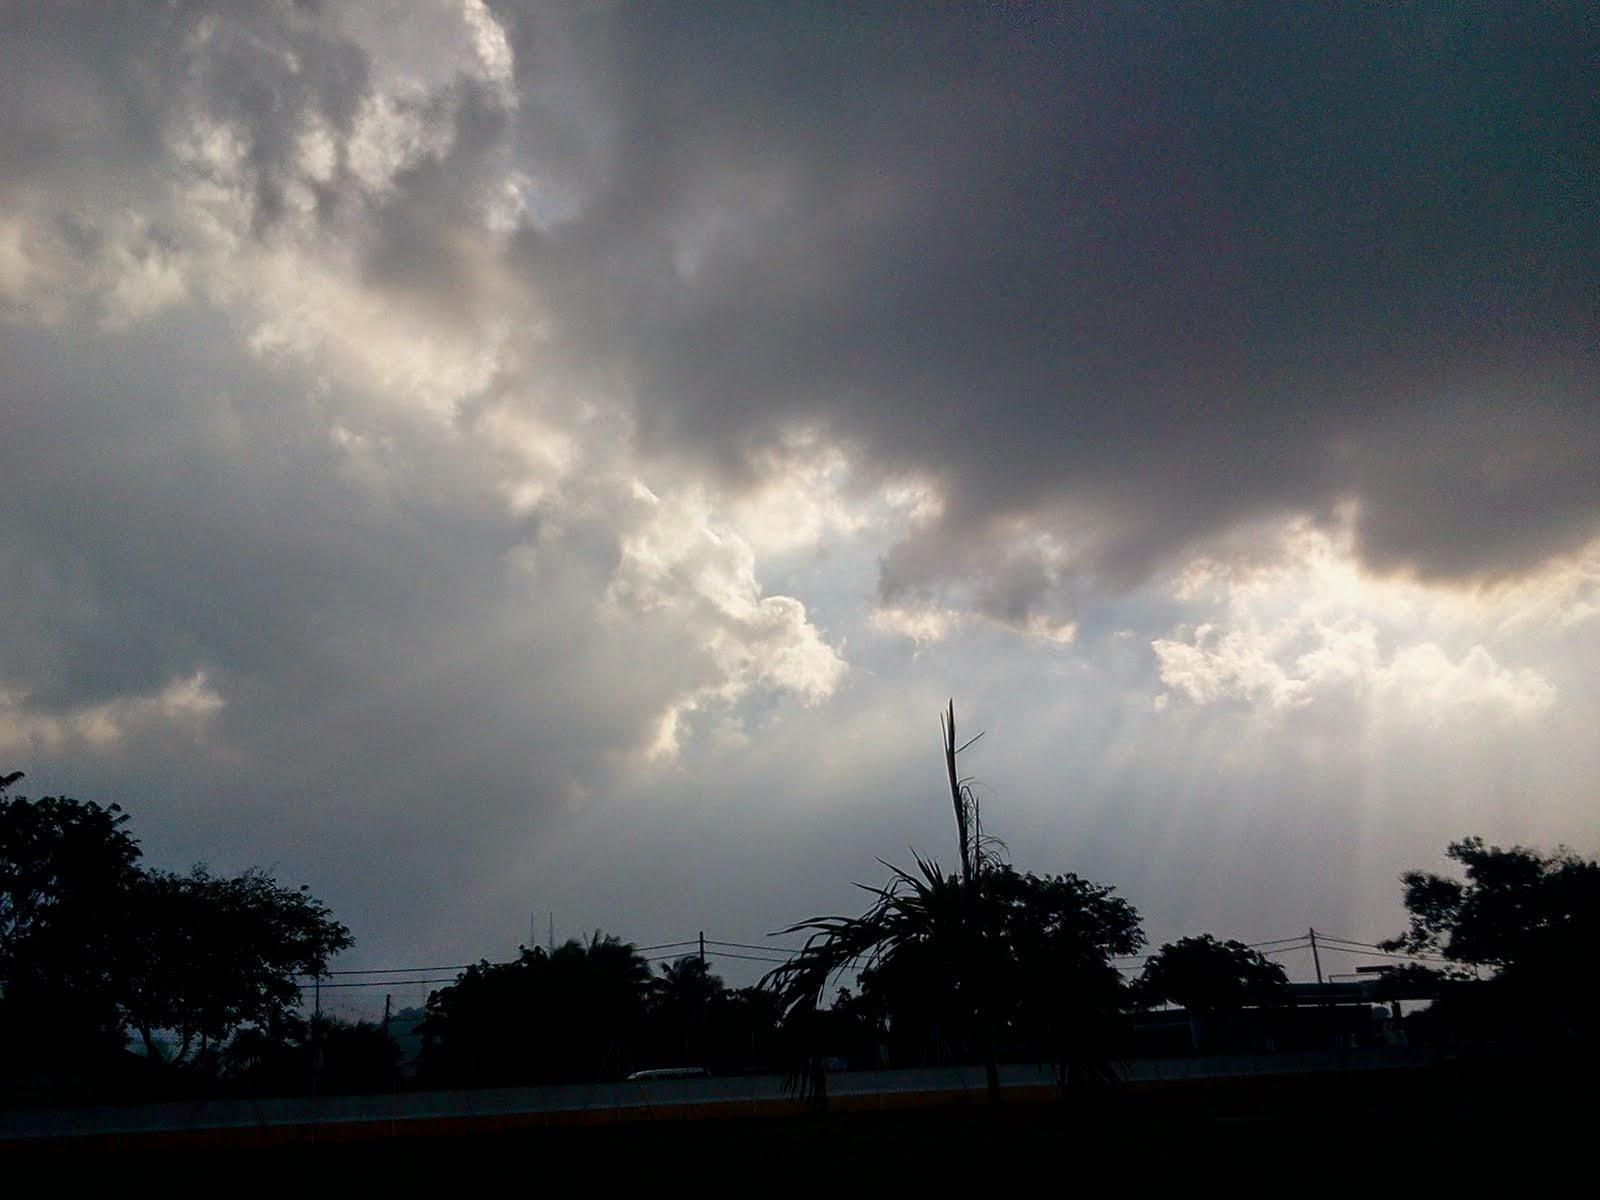 mimpi langit mendung gelap